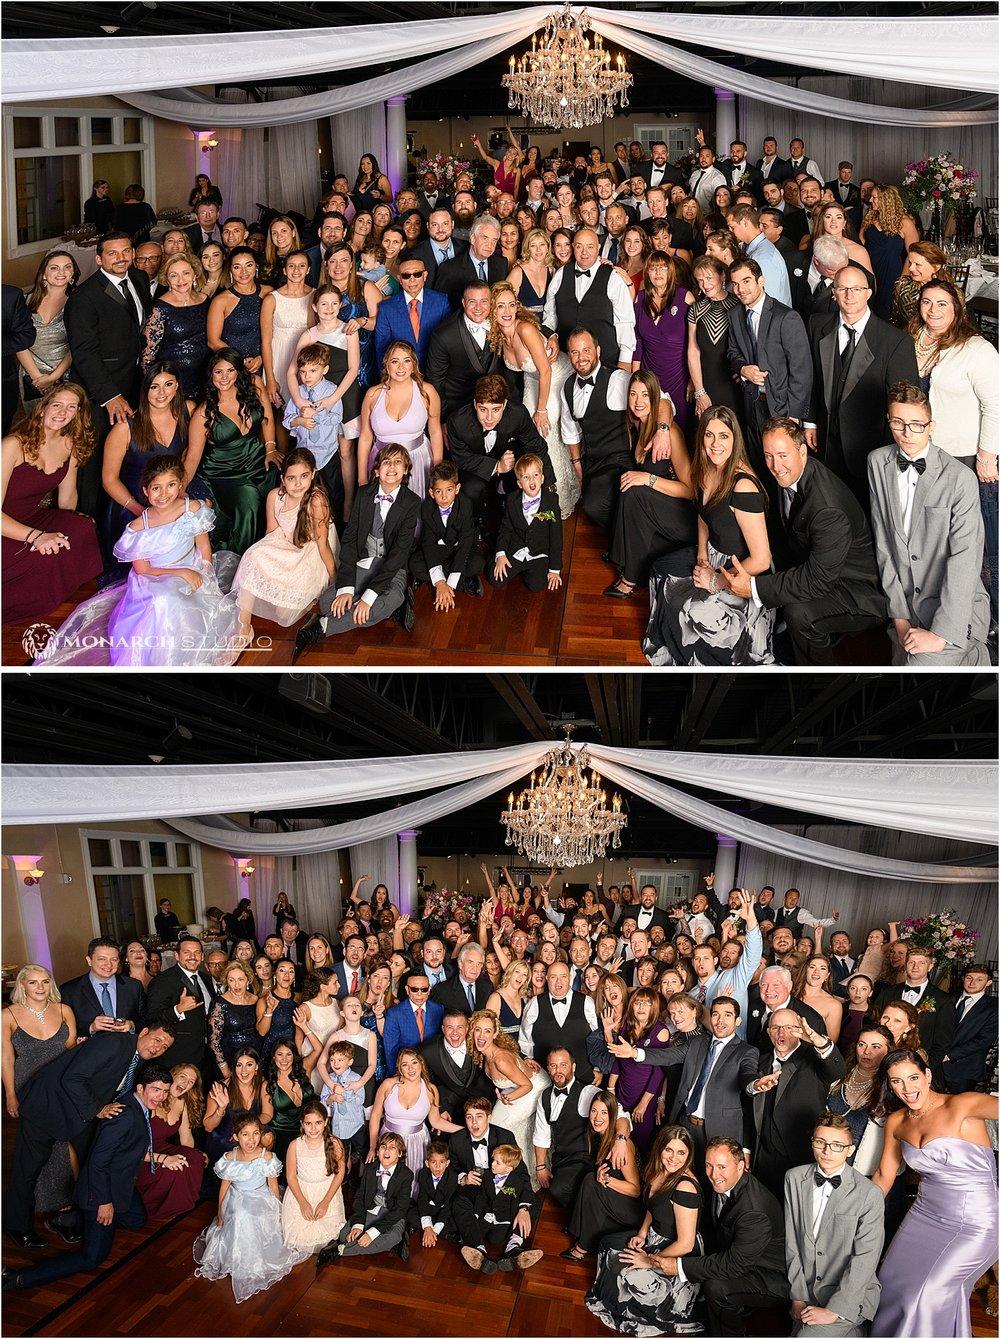 The-Whiteroom-Wedding-Photography-Saint-Augustine-Florida (161).jpg